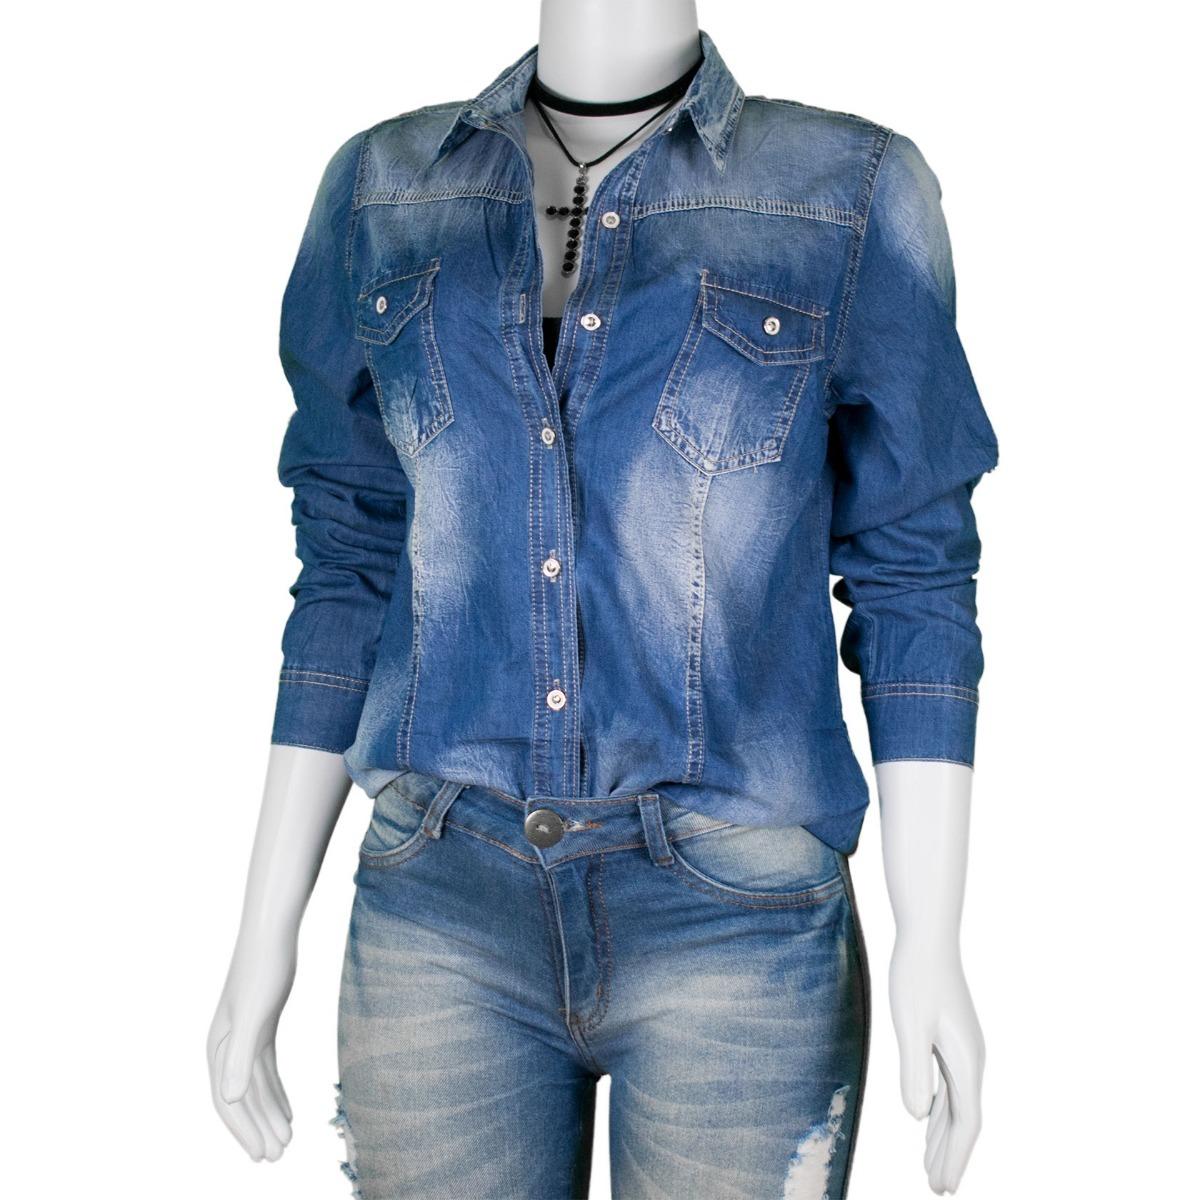 178e5e29aa camisa jeans feminino manga longa kit 3un atacado. Carregando zoom.